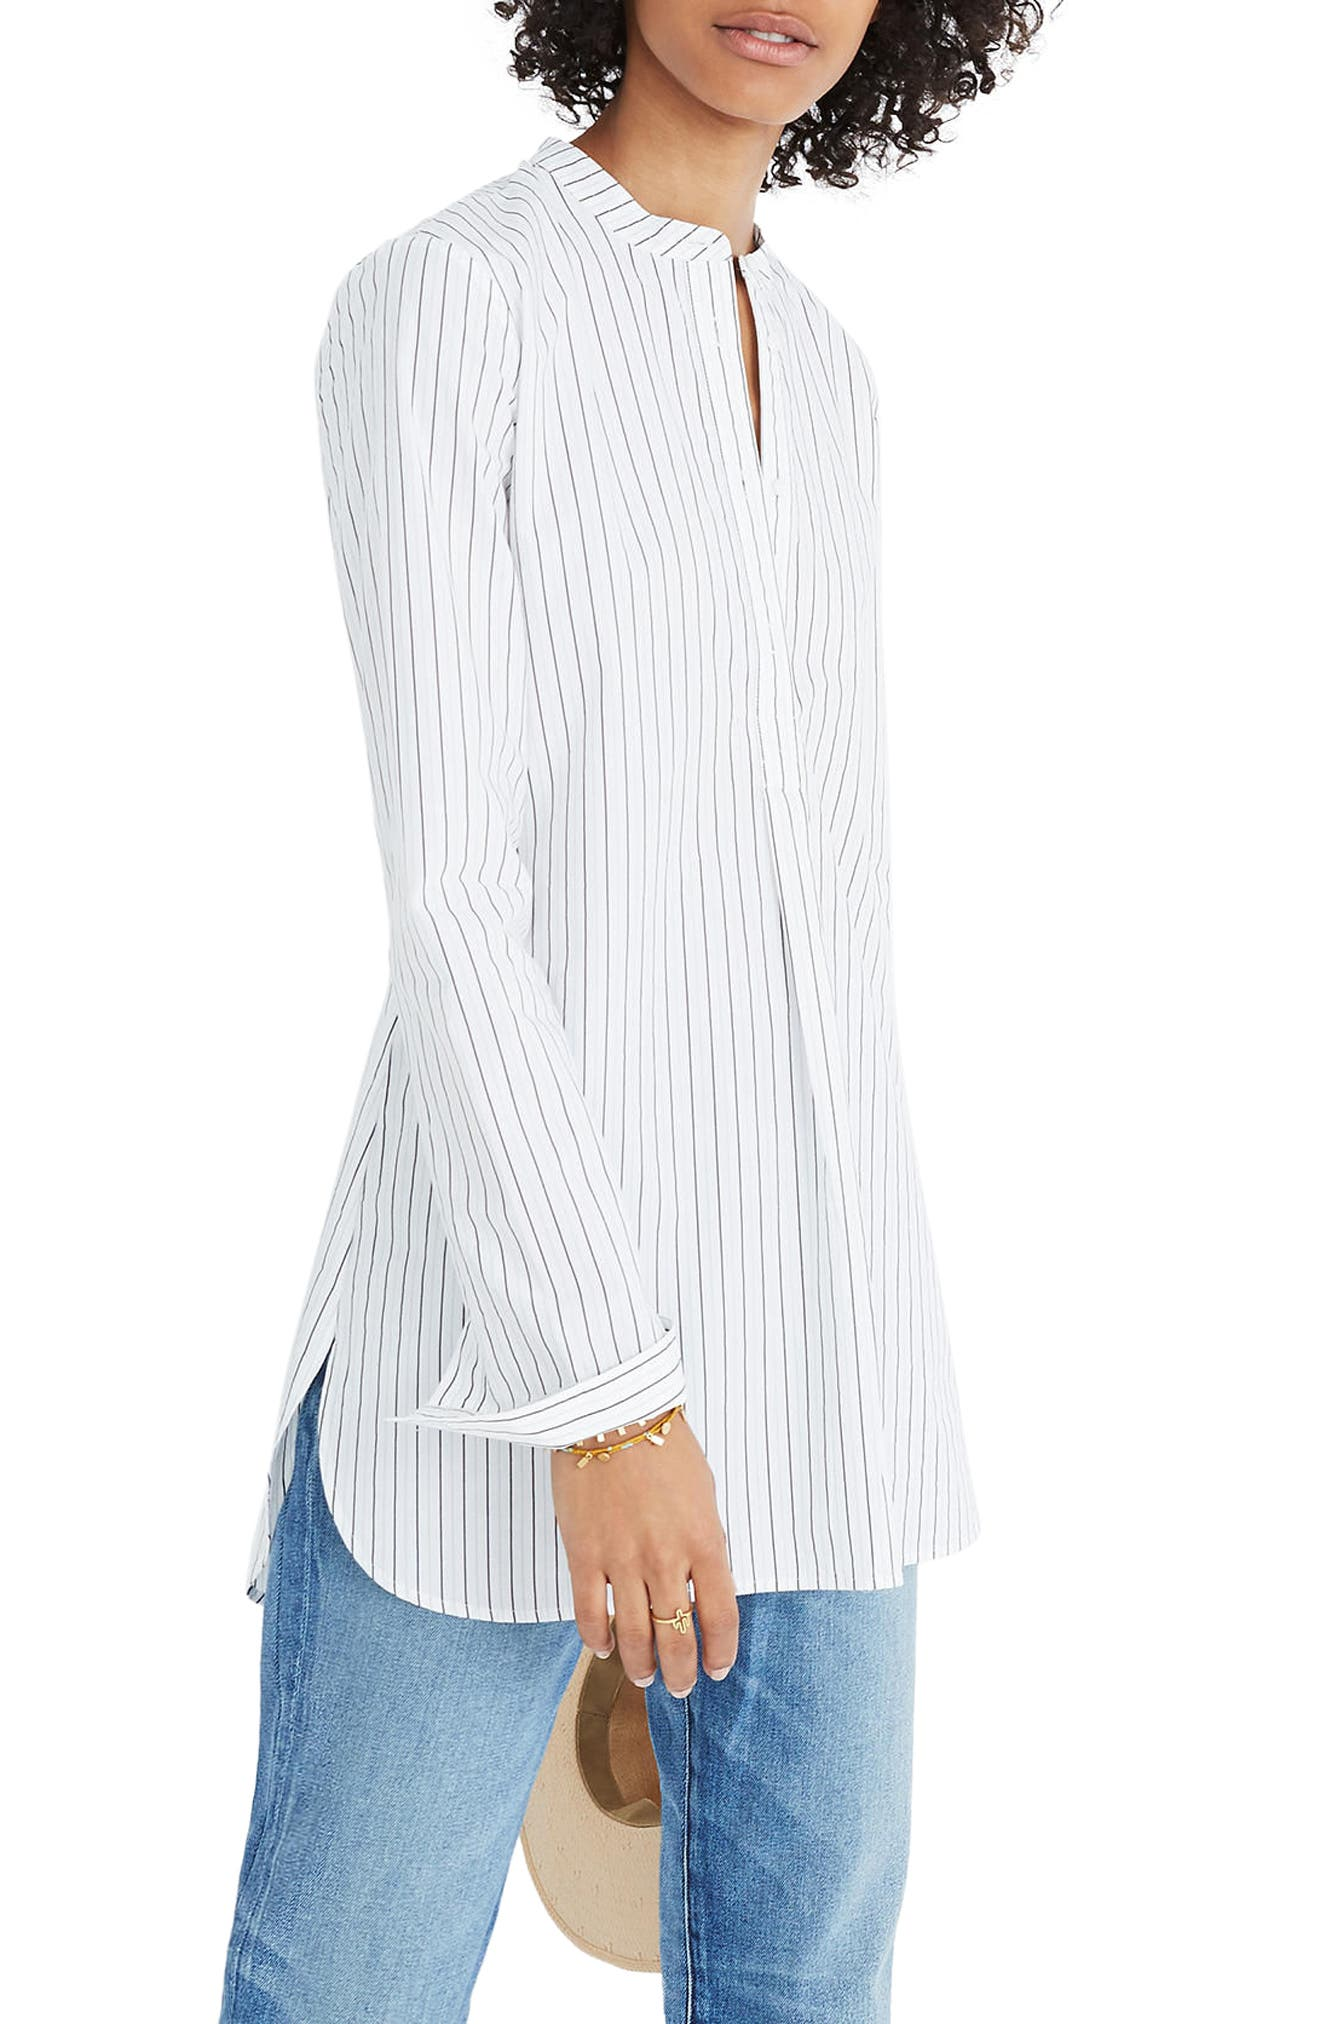 Main Image - Madewell Wellspring Stripe Tunic Popover Shirt